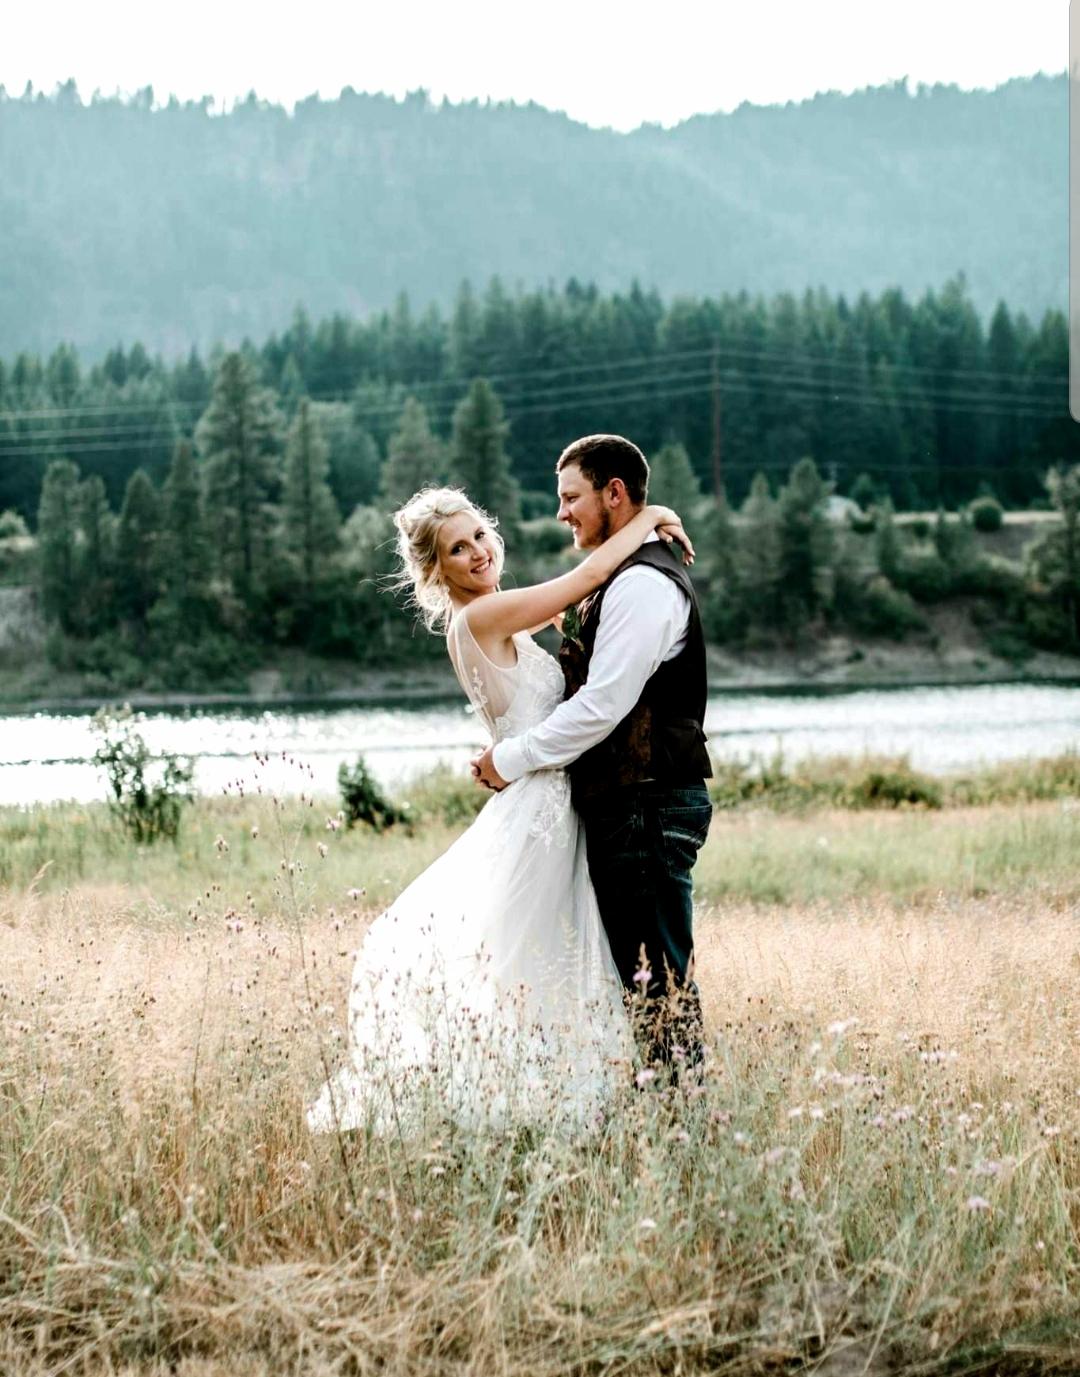 Love in the Wheat Field